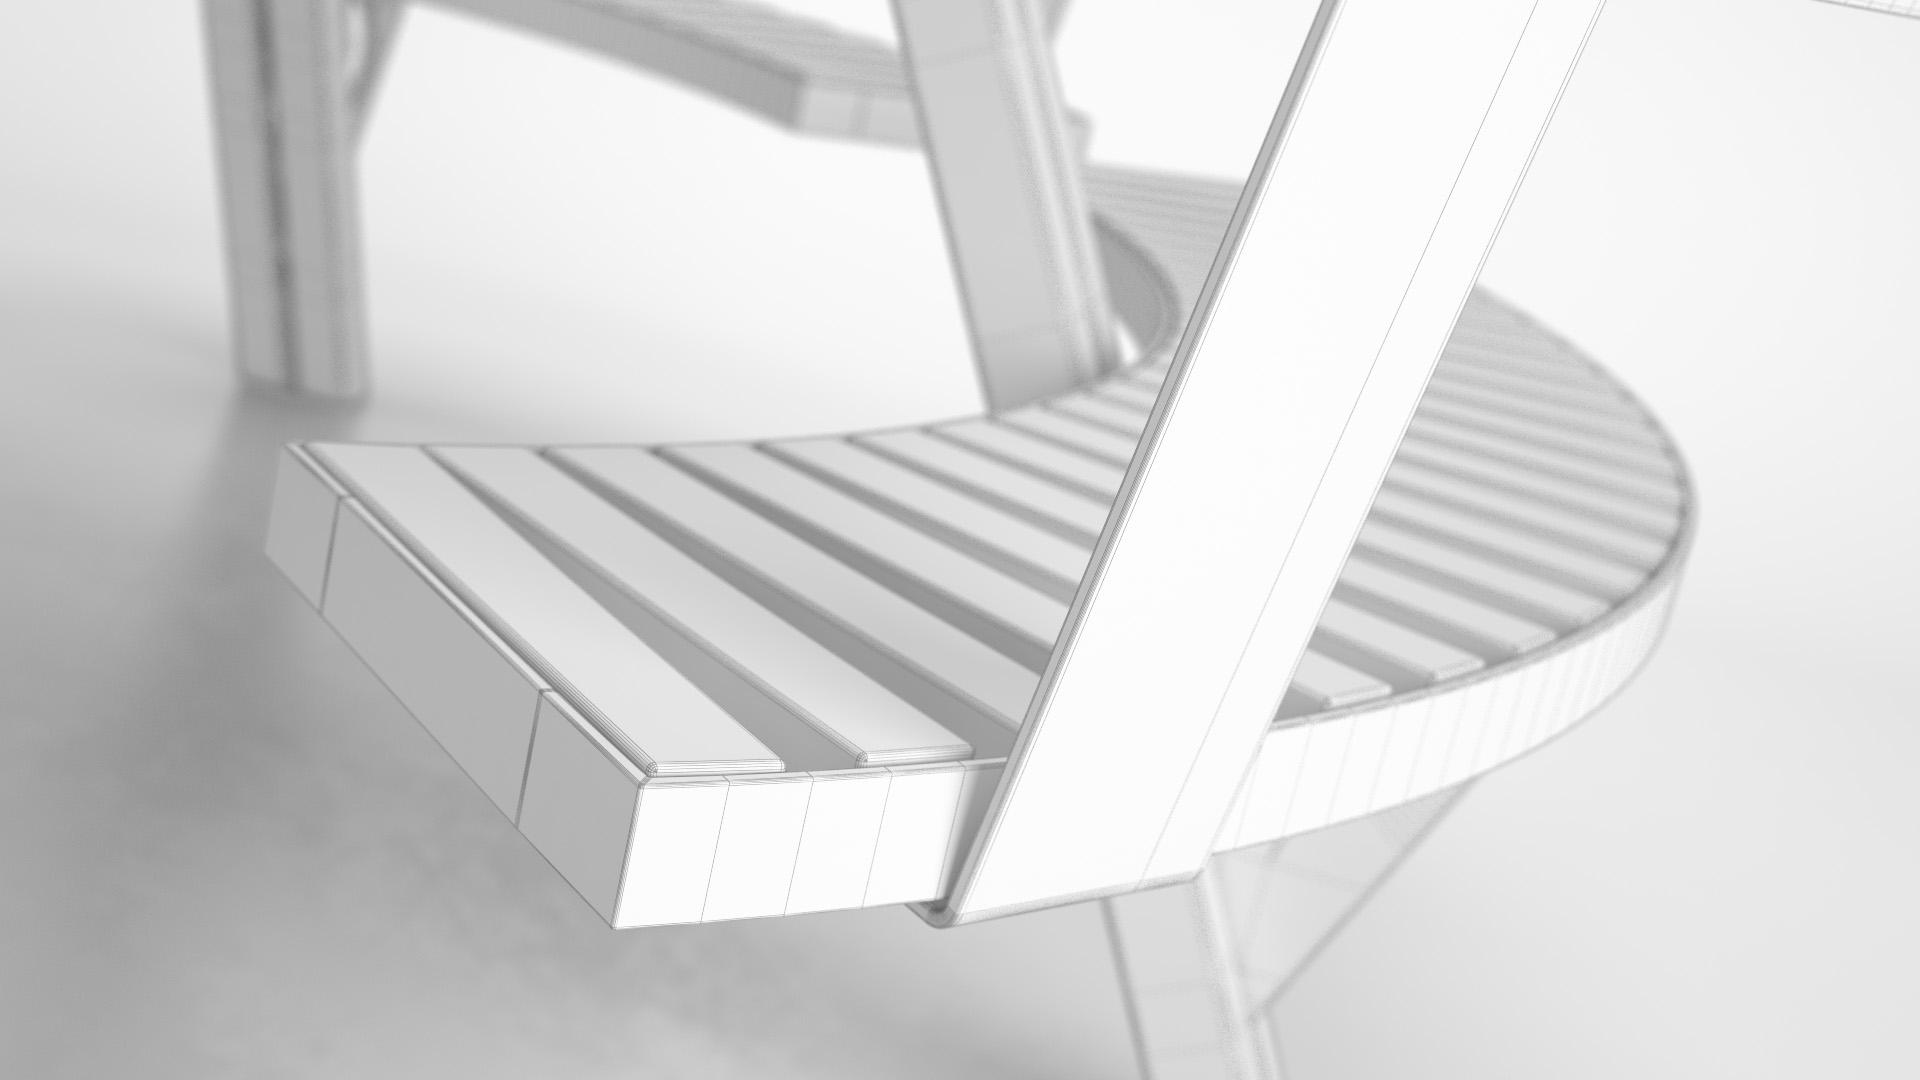 Gargantua_Table_Mode3_WhiteSet_01_wire_0005